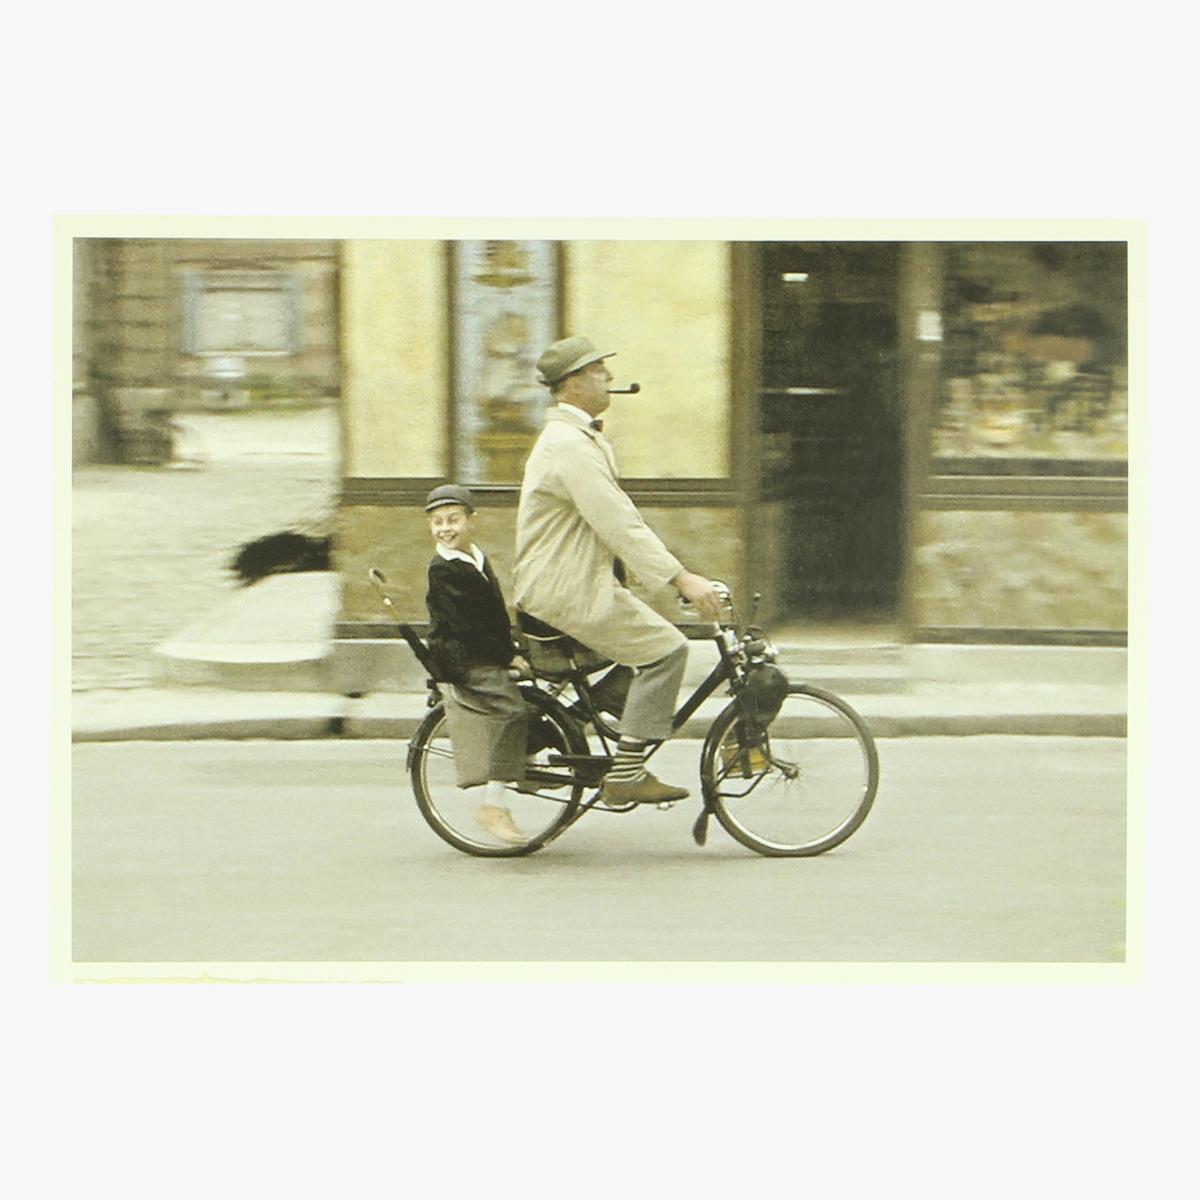 Afbeeldingen van postkaart Les Film Mon Oncle (Jacques Tati) 1958 france repro